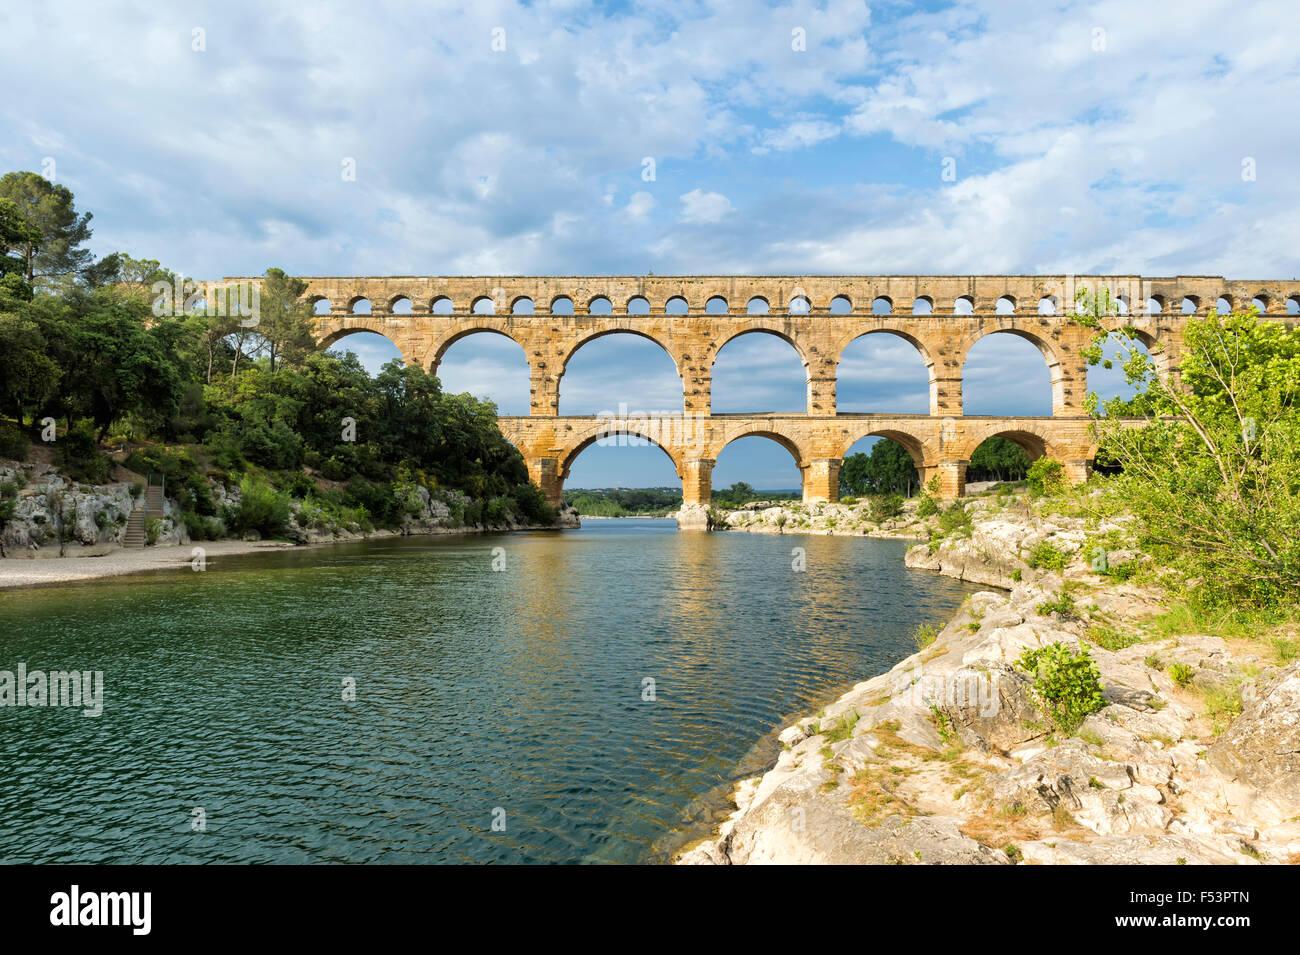 Pont du Gard, Languedoc Roussillon region, France, Unesco World Heritage Site - Stock Image